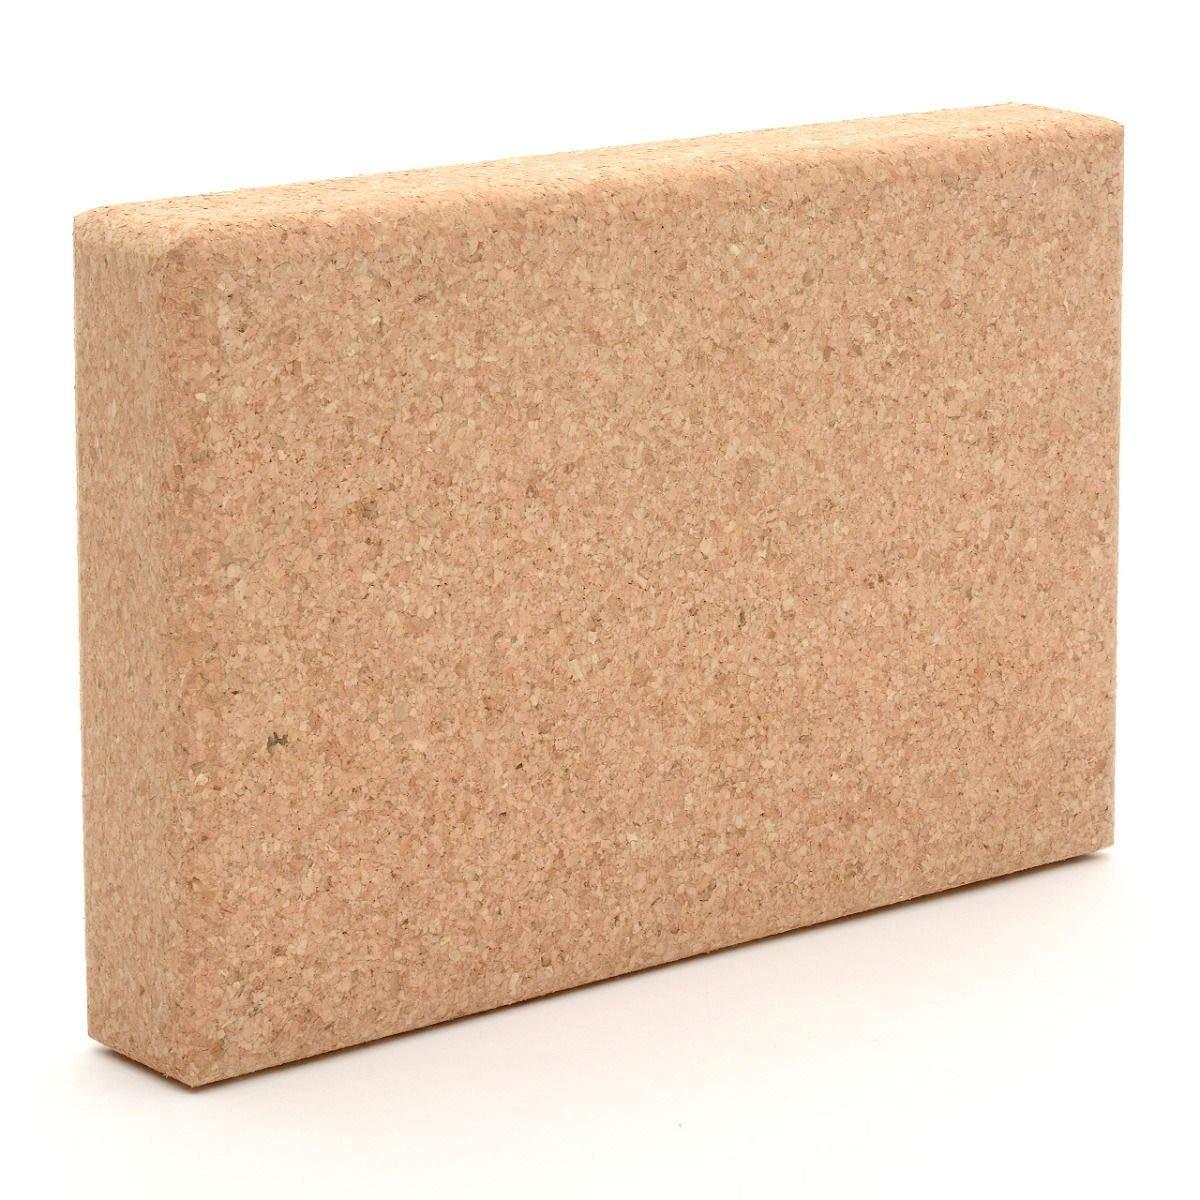 Amazon.com : Cork Yoga Block Plank Balance Pad - by ...